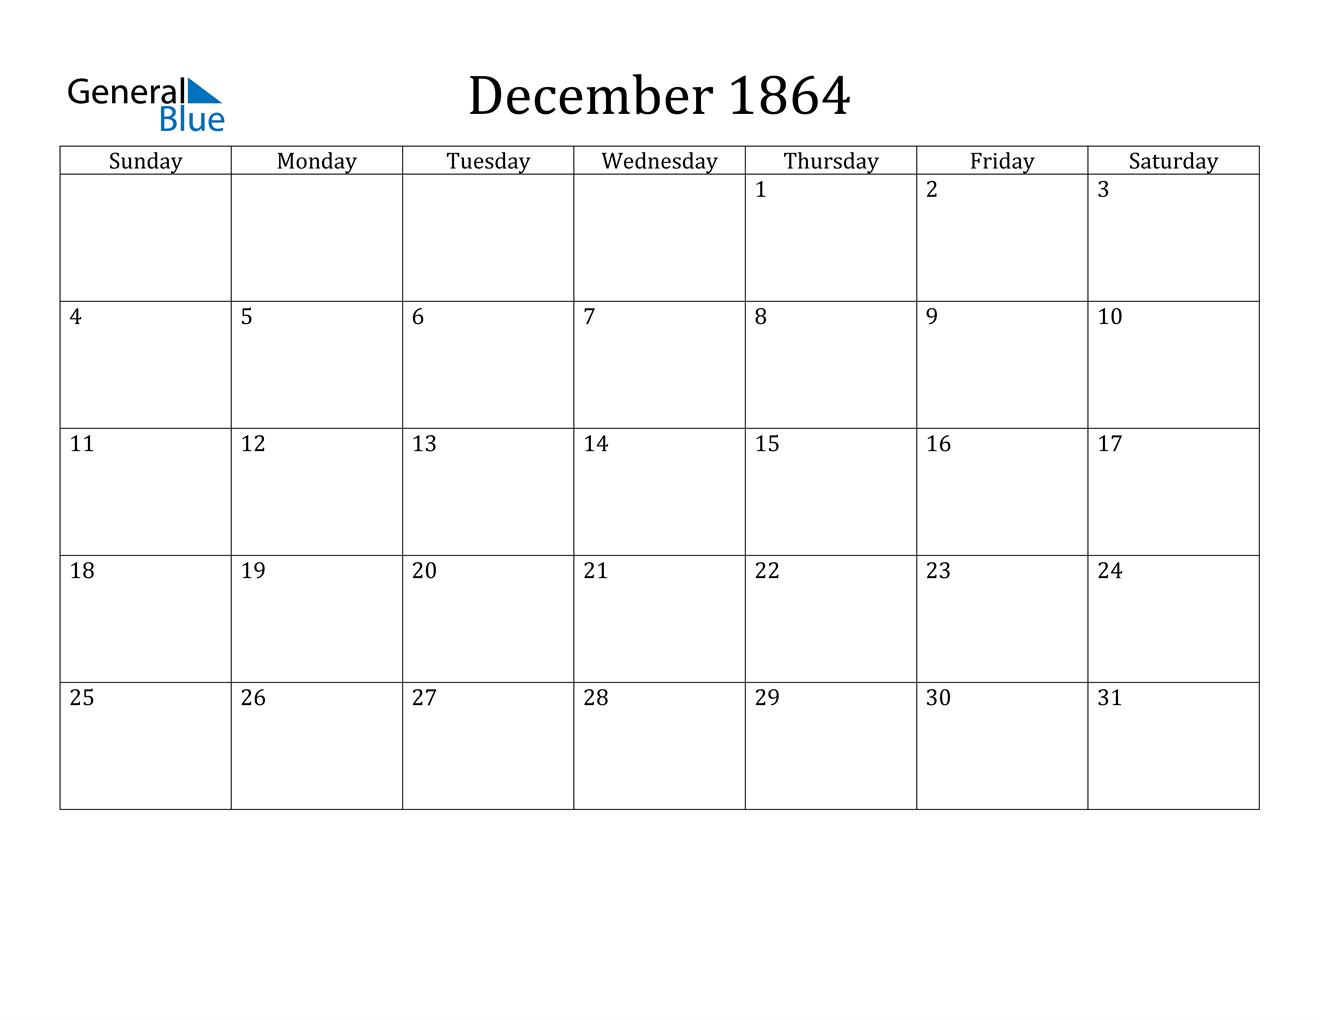 Image of December 1864 Calendar